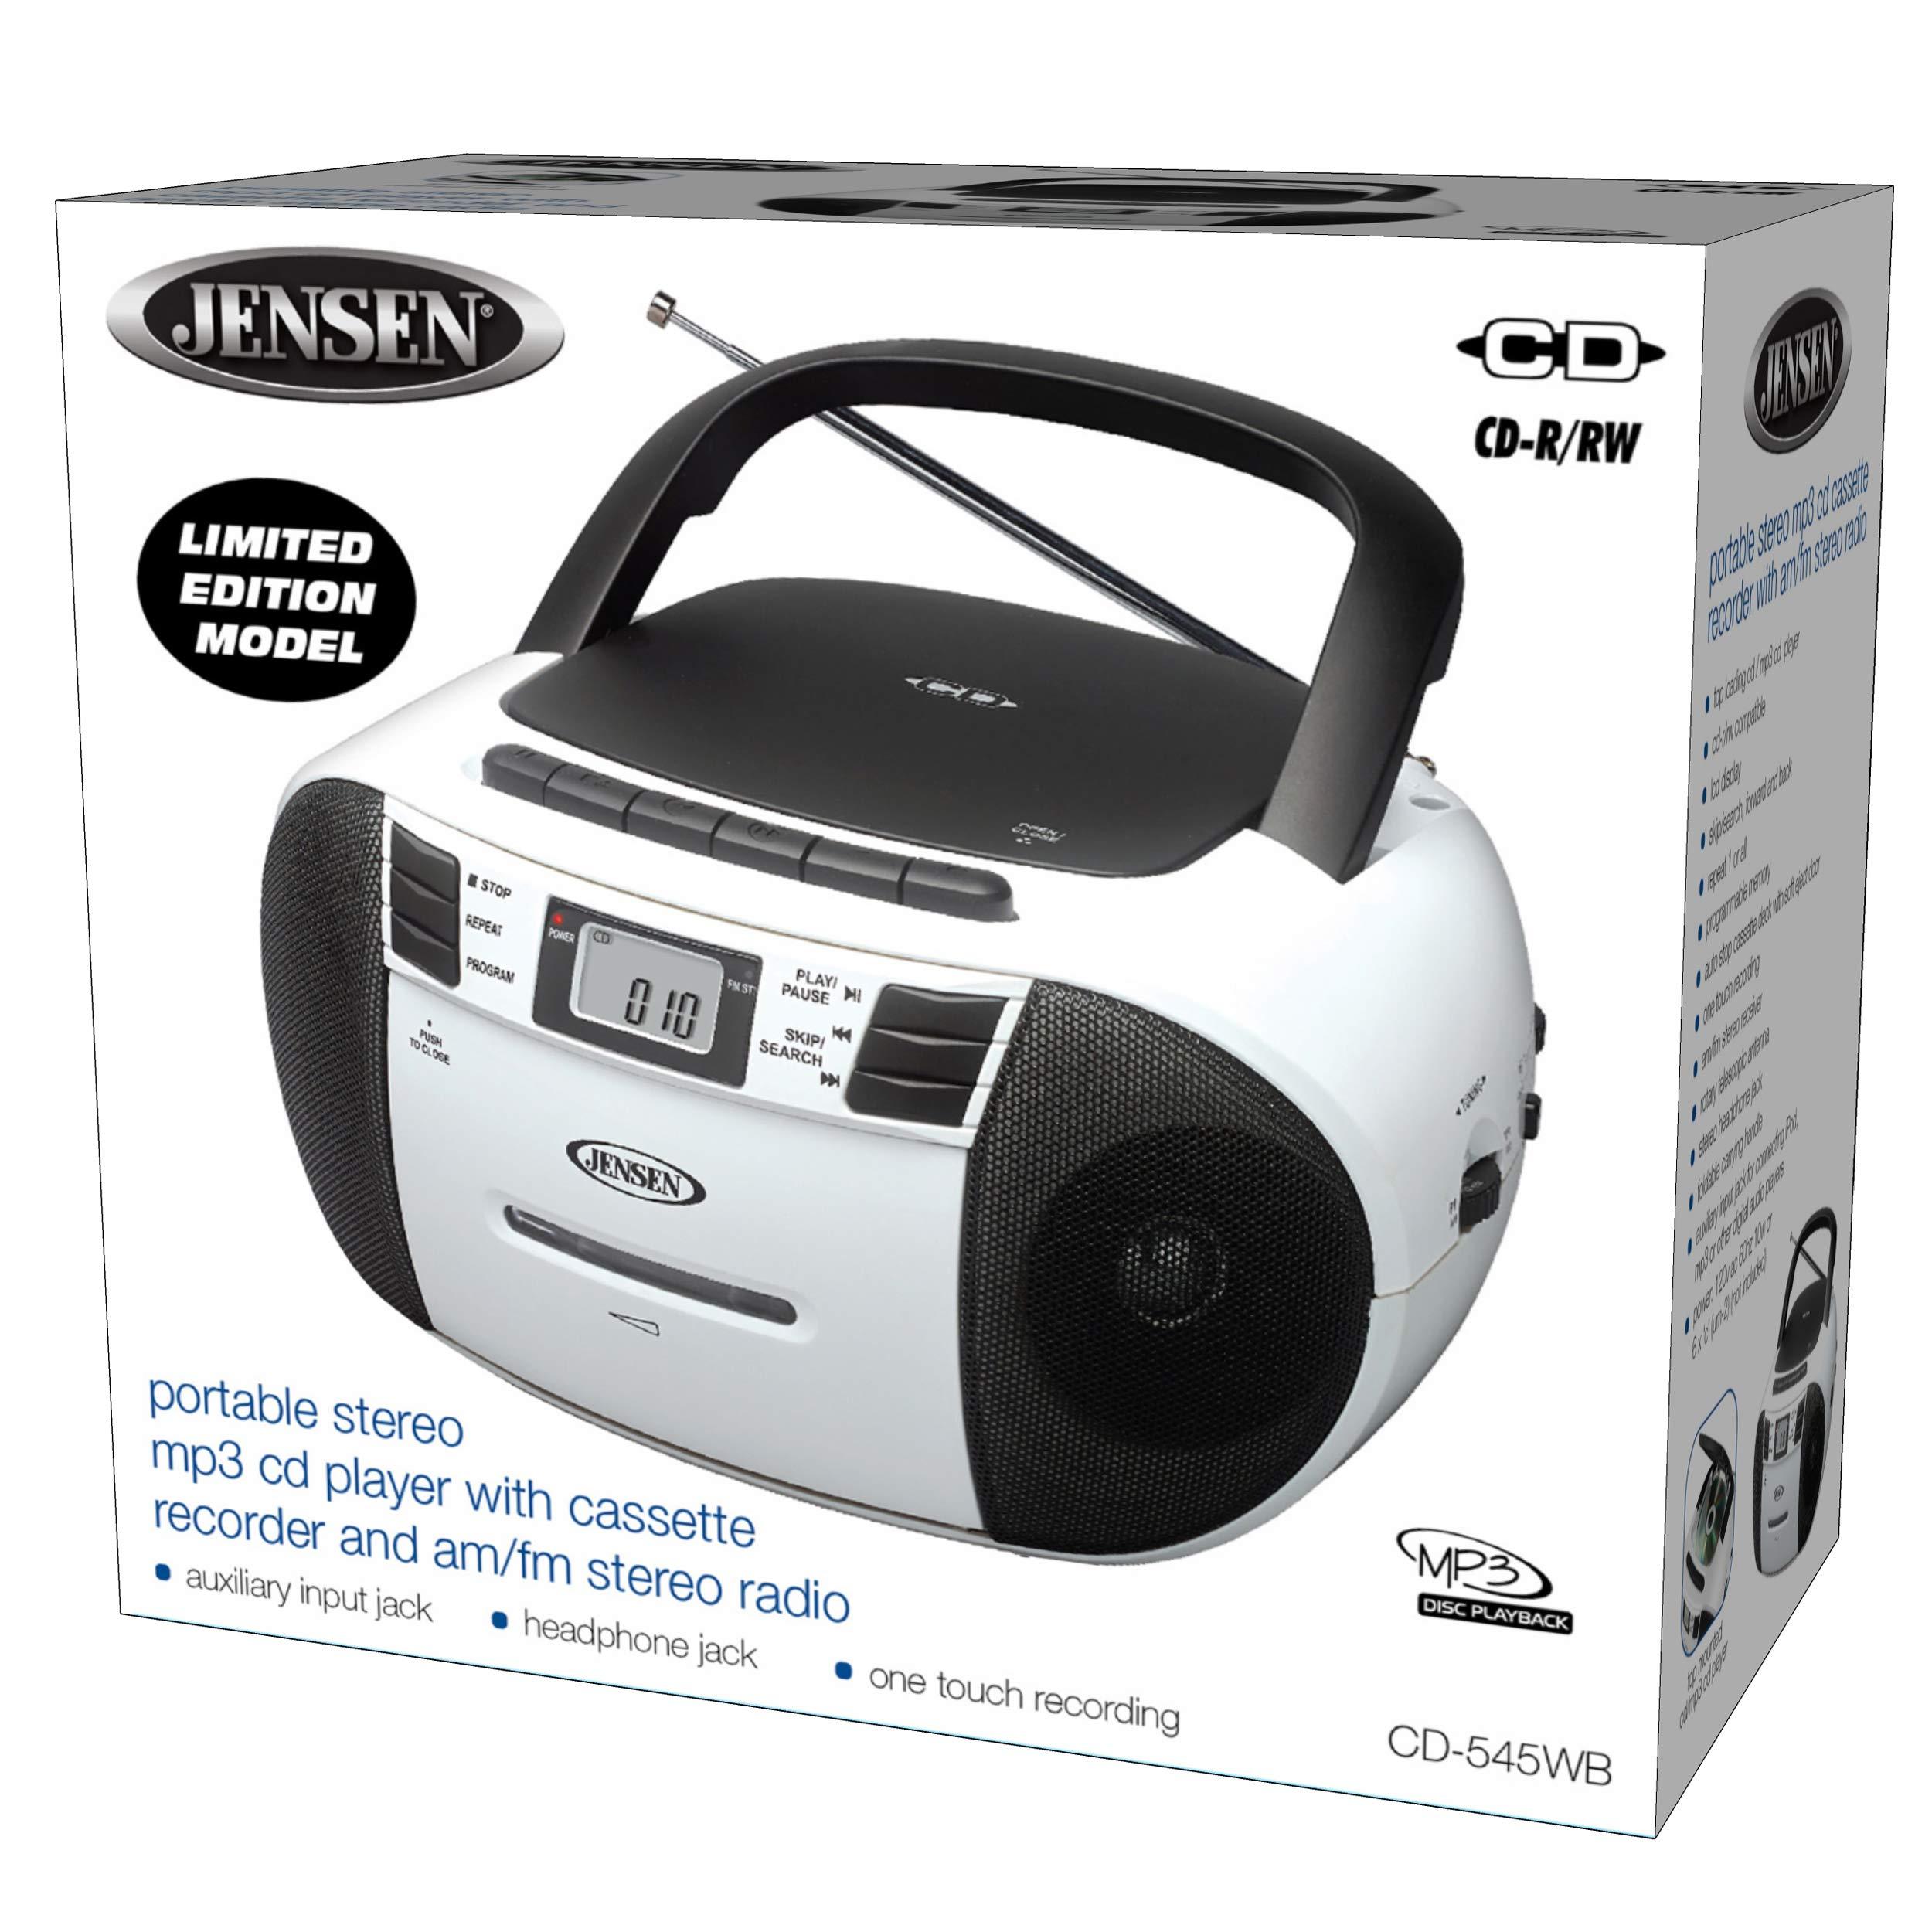 Jensen CD-545MP3 Black/White Top-Loading CD/MP3 AM/FM Radio Cassette Player, and Recorder Boombox Home Audio, Aux, Headphone (Black/Matte White) by Jensen (Image #4)